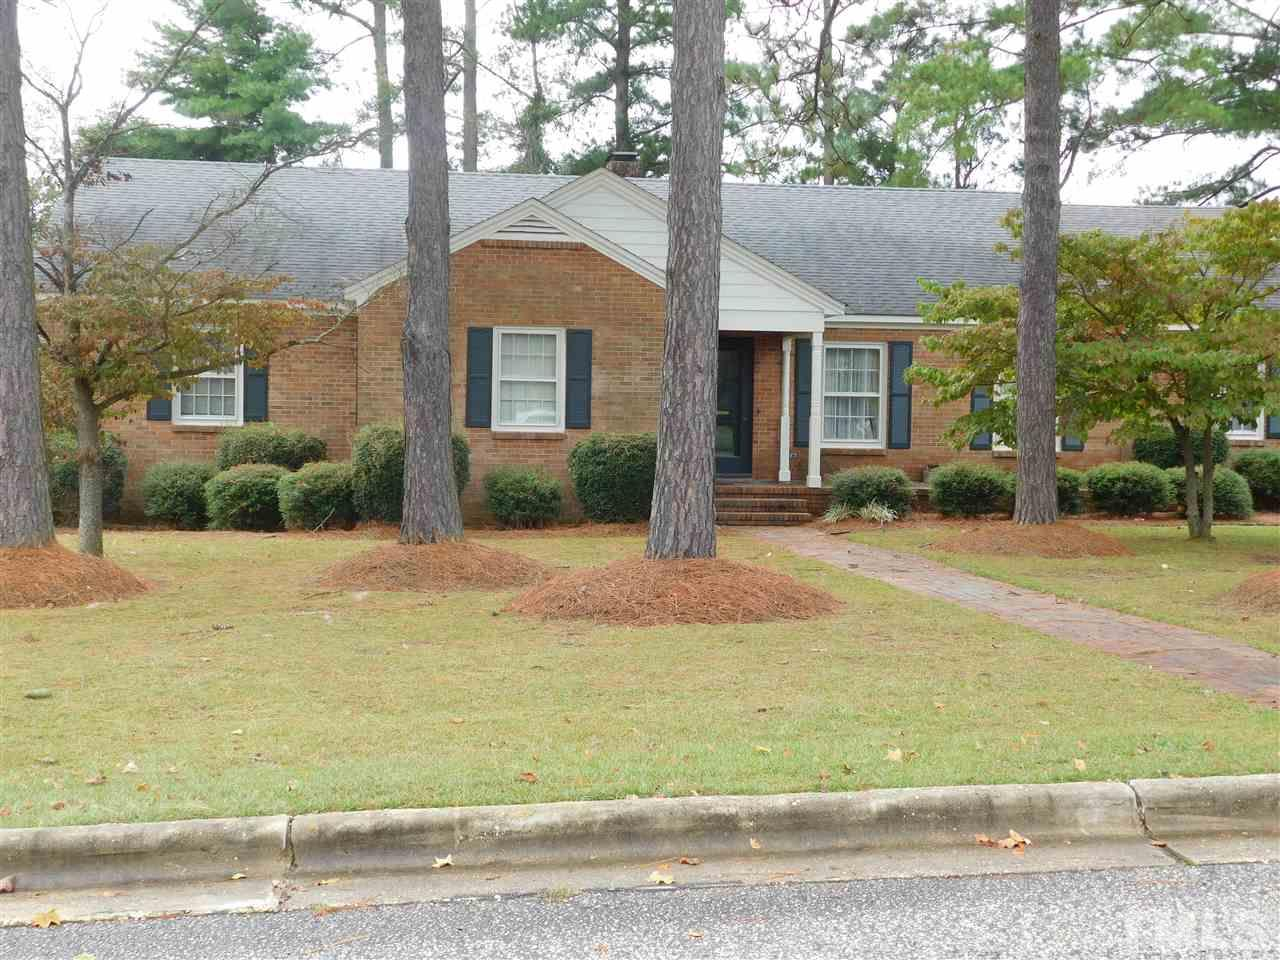 302 S Pine St, Benson, NC